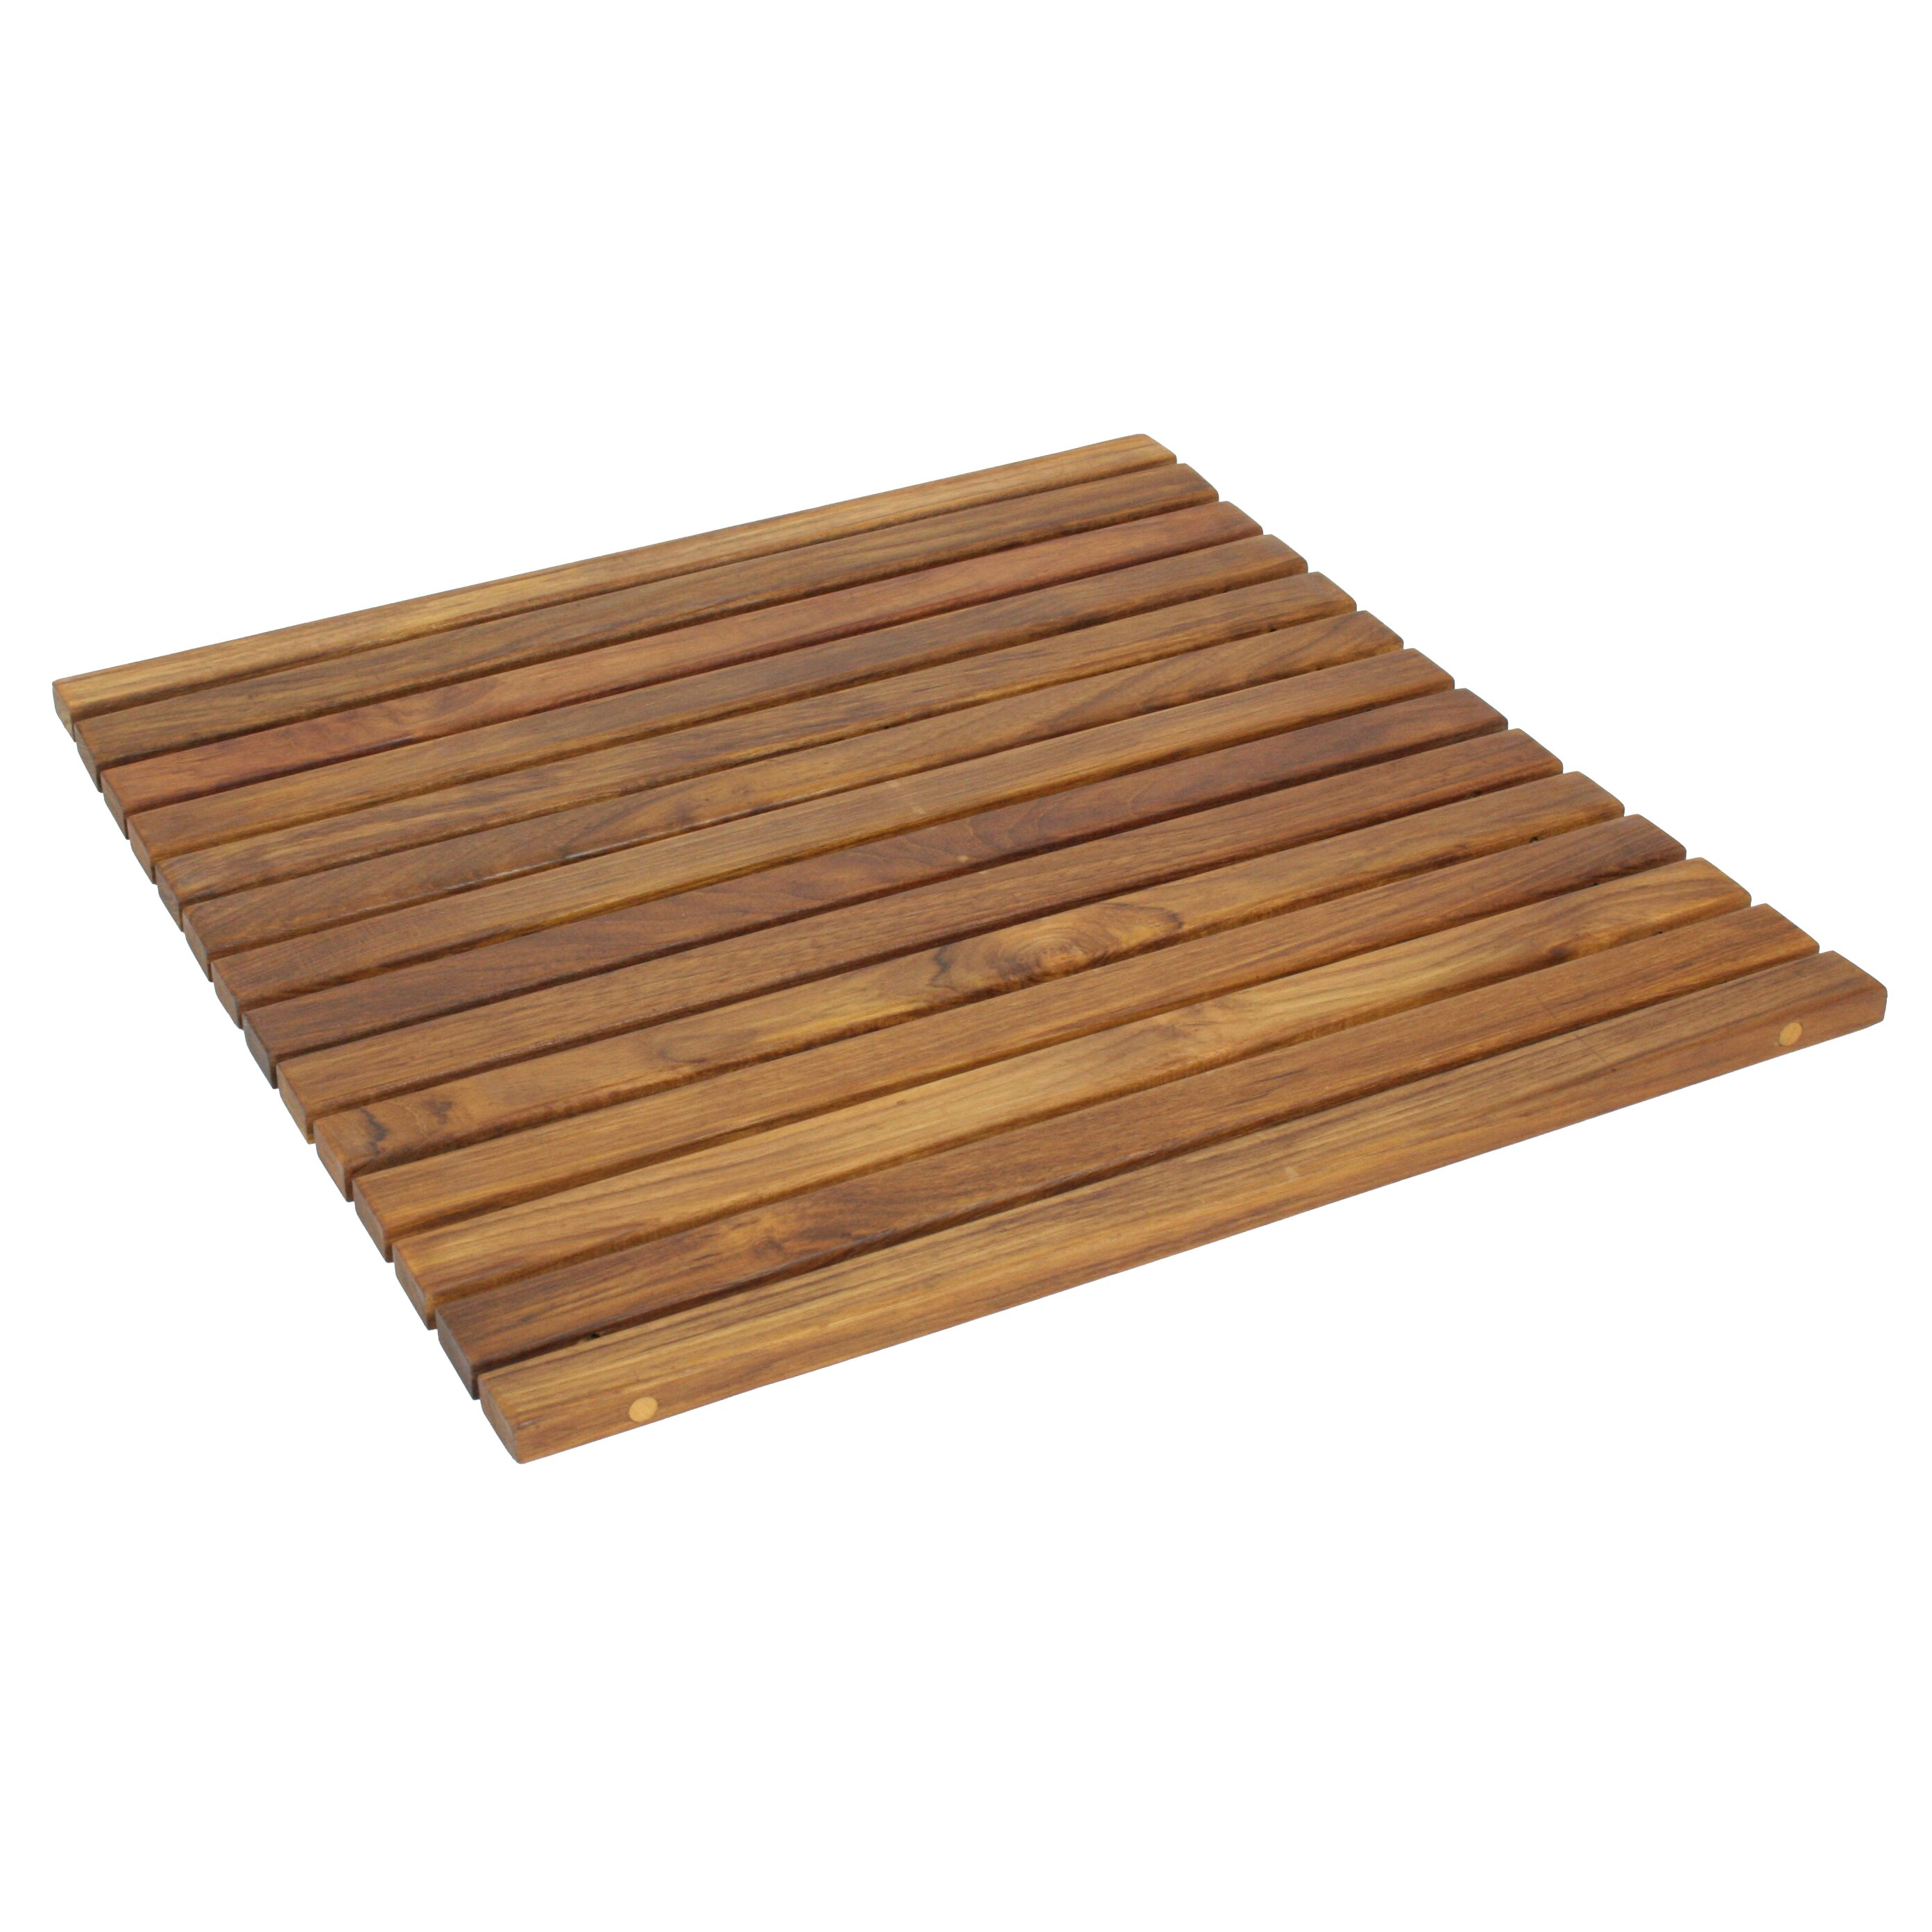 seateak wooden bath mat reviews wayfair. Black Bedroom Furniture Sets. Home Design Ideas